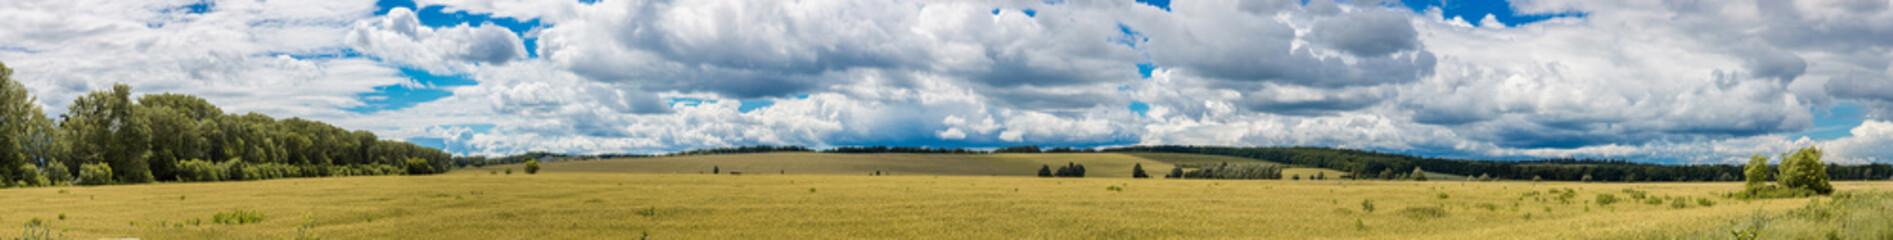 A wheat field, fresh crop of wheat